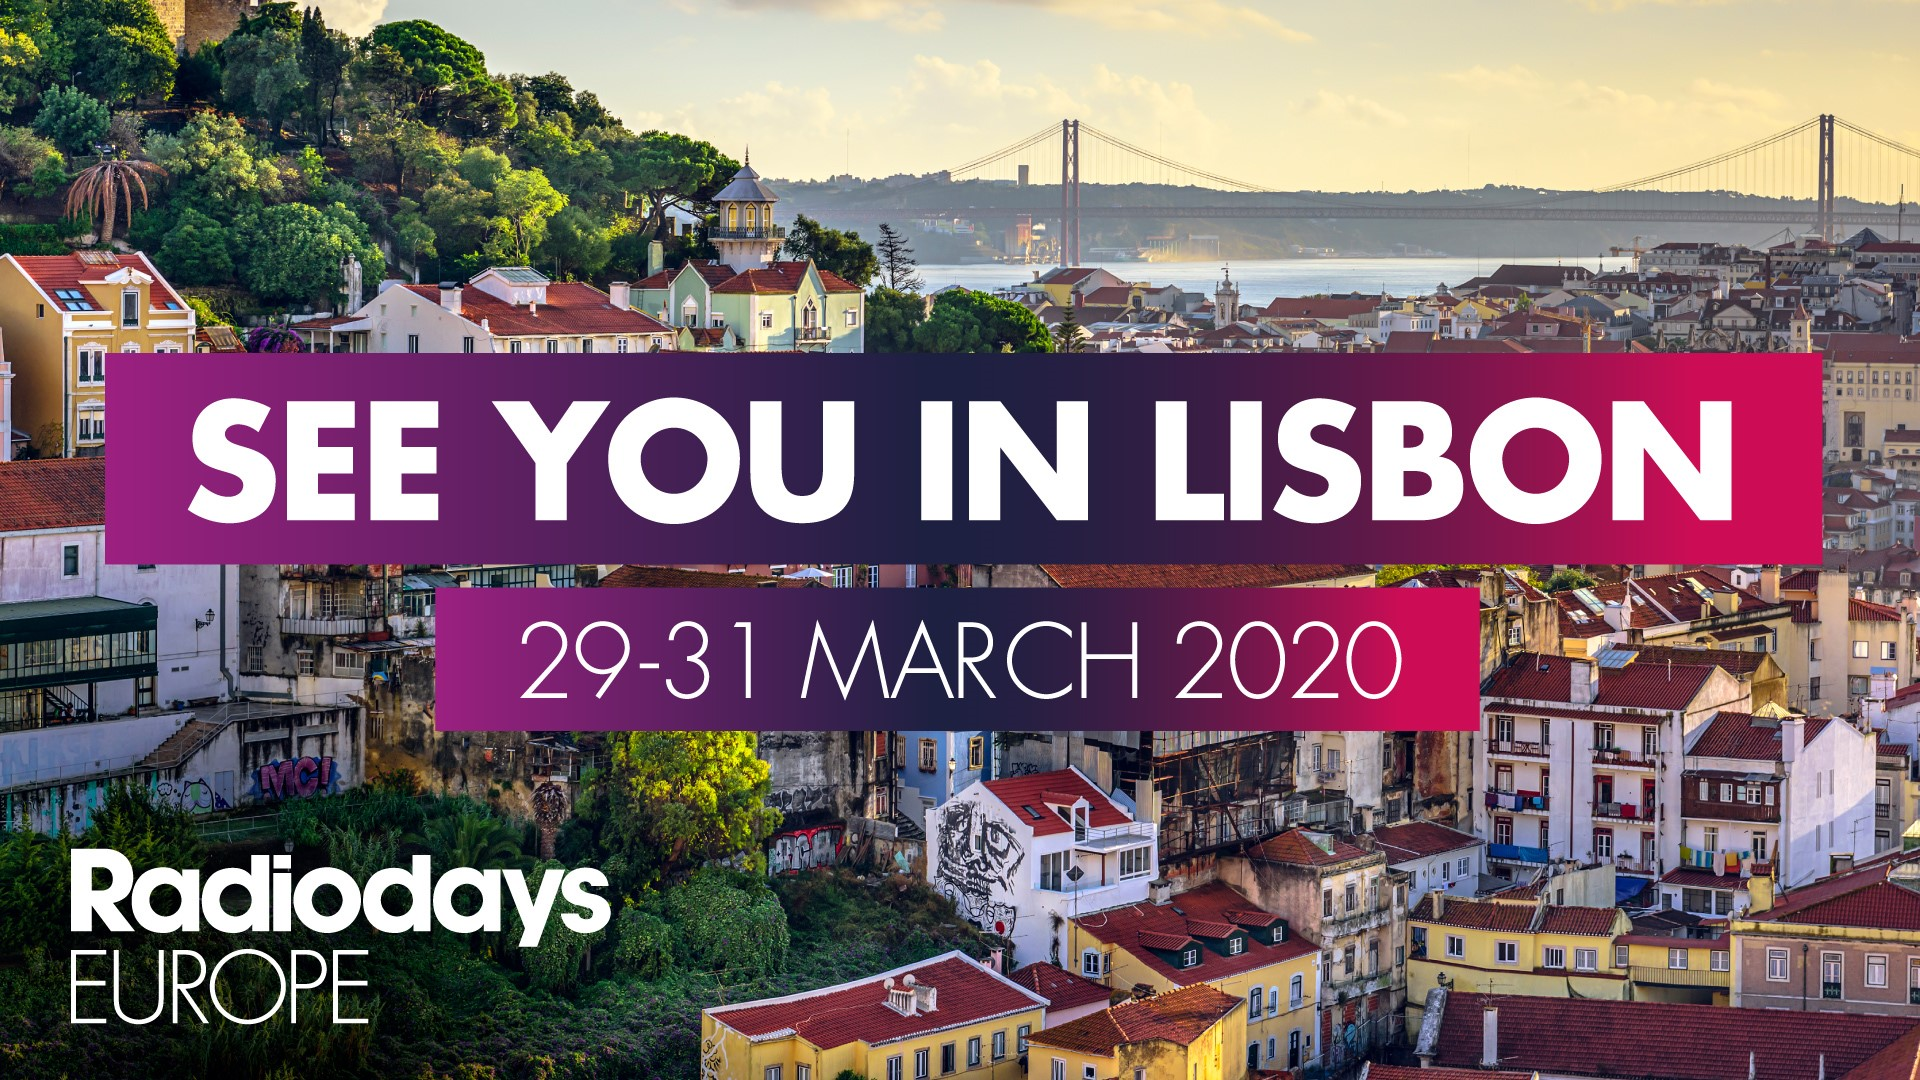 RADIODAYS EUROPE Lisbon 2020